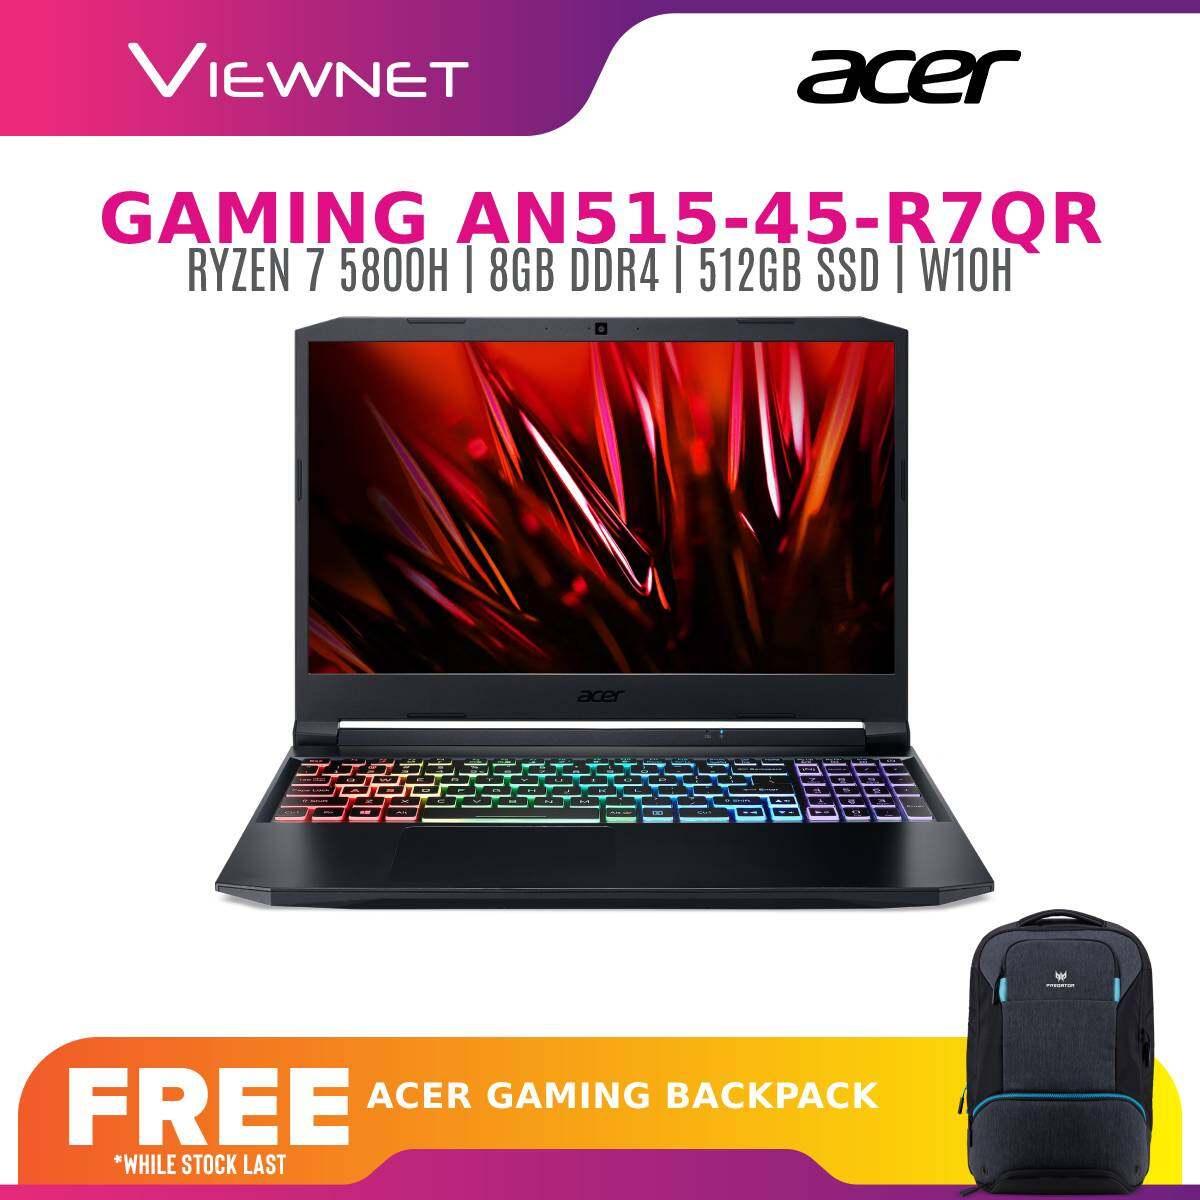 ACER NITRO 5 GAMING LAPTOP AN515-45-R7QR (RYZEN 7) AN515-45-R9RJ (RYZEN 5) [NVIDIA GTX1650, 8GB DDR4, 512GB SSD, 15.6